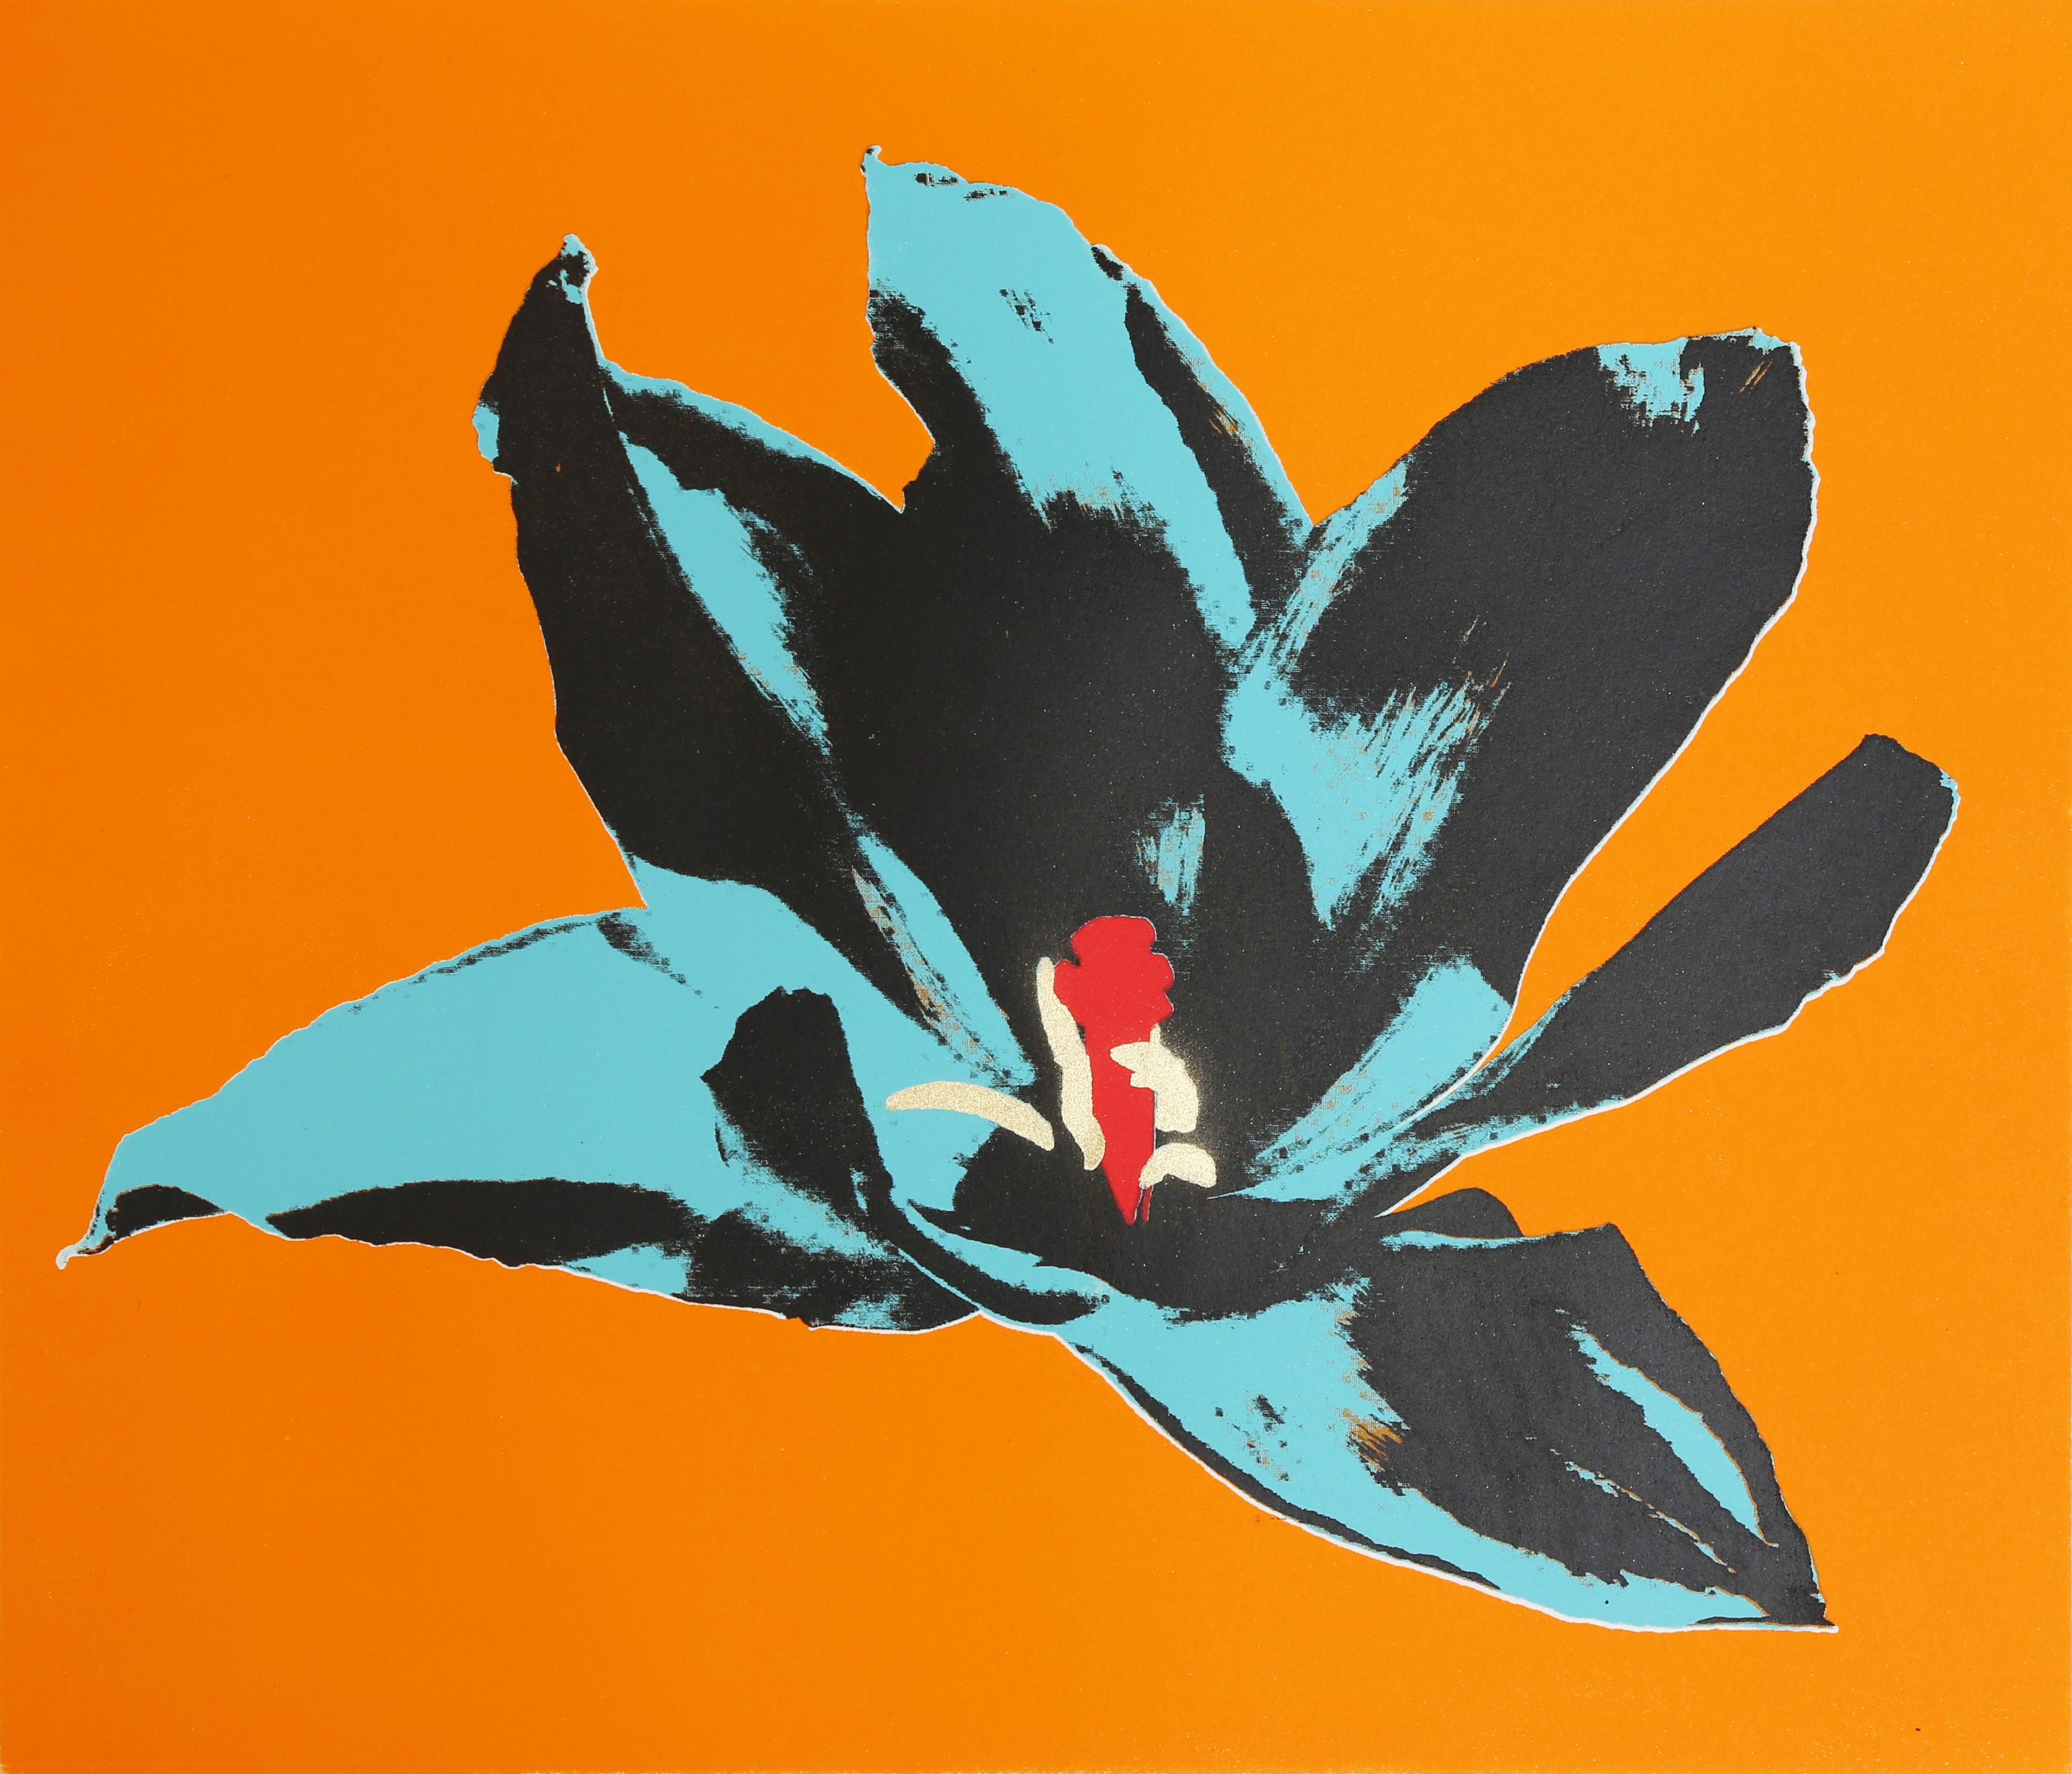 Flower Power - Orange is the New Black